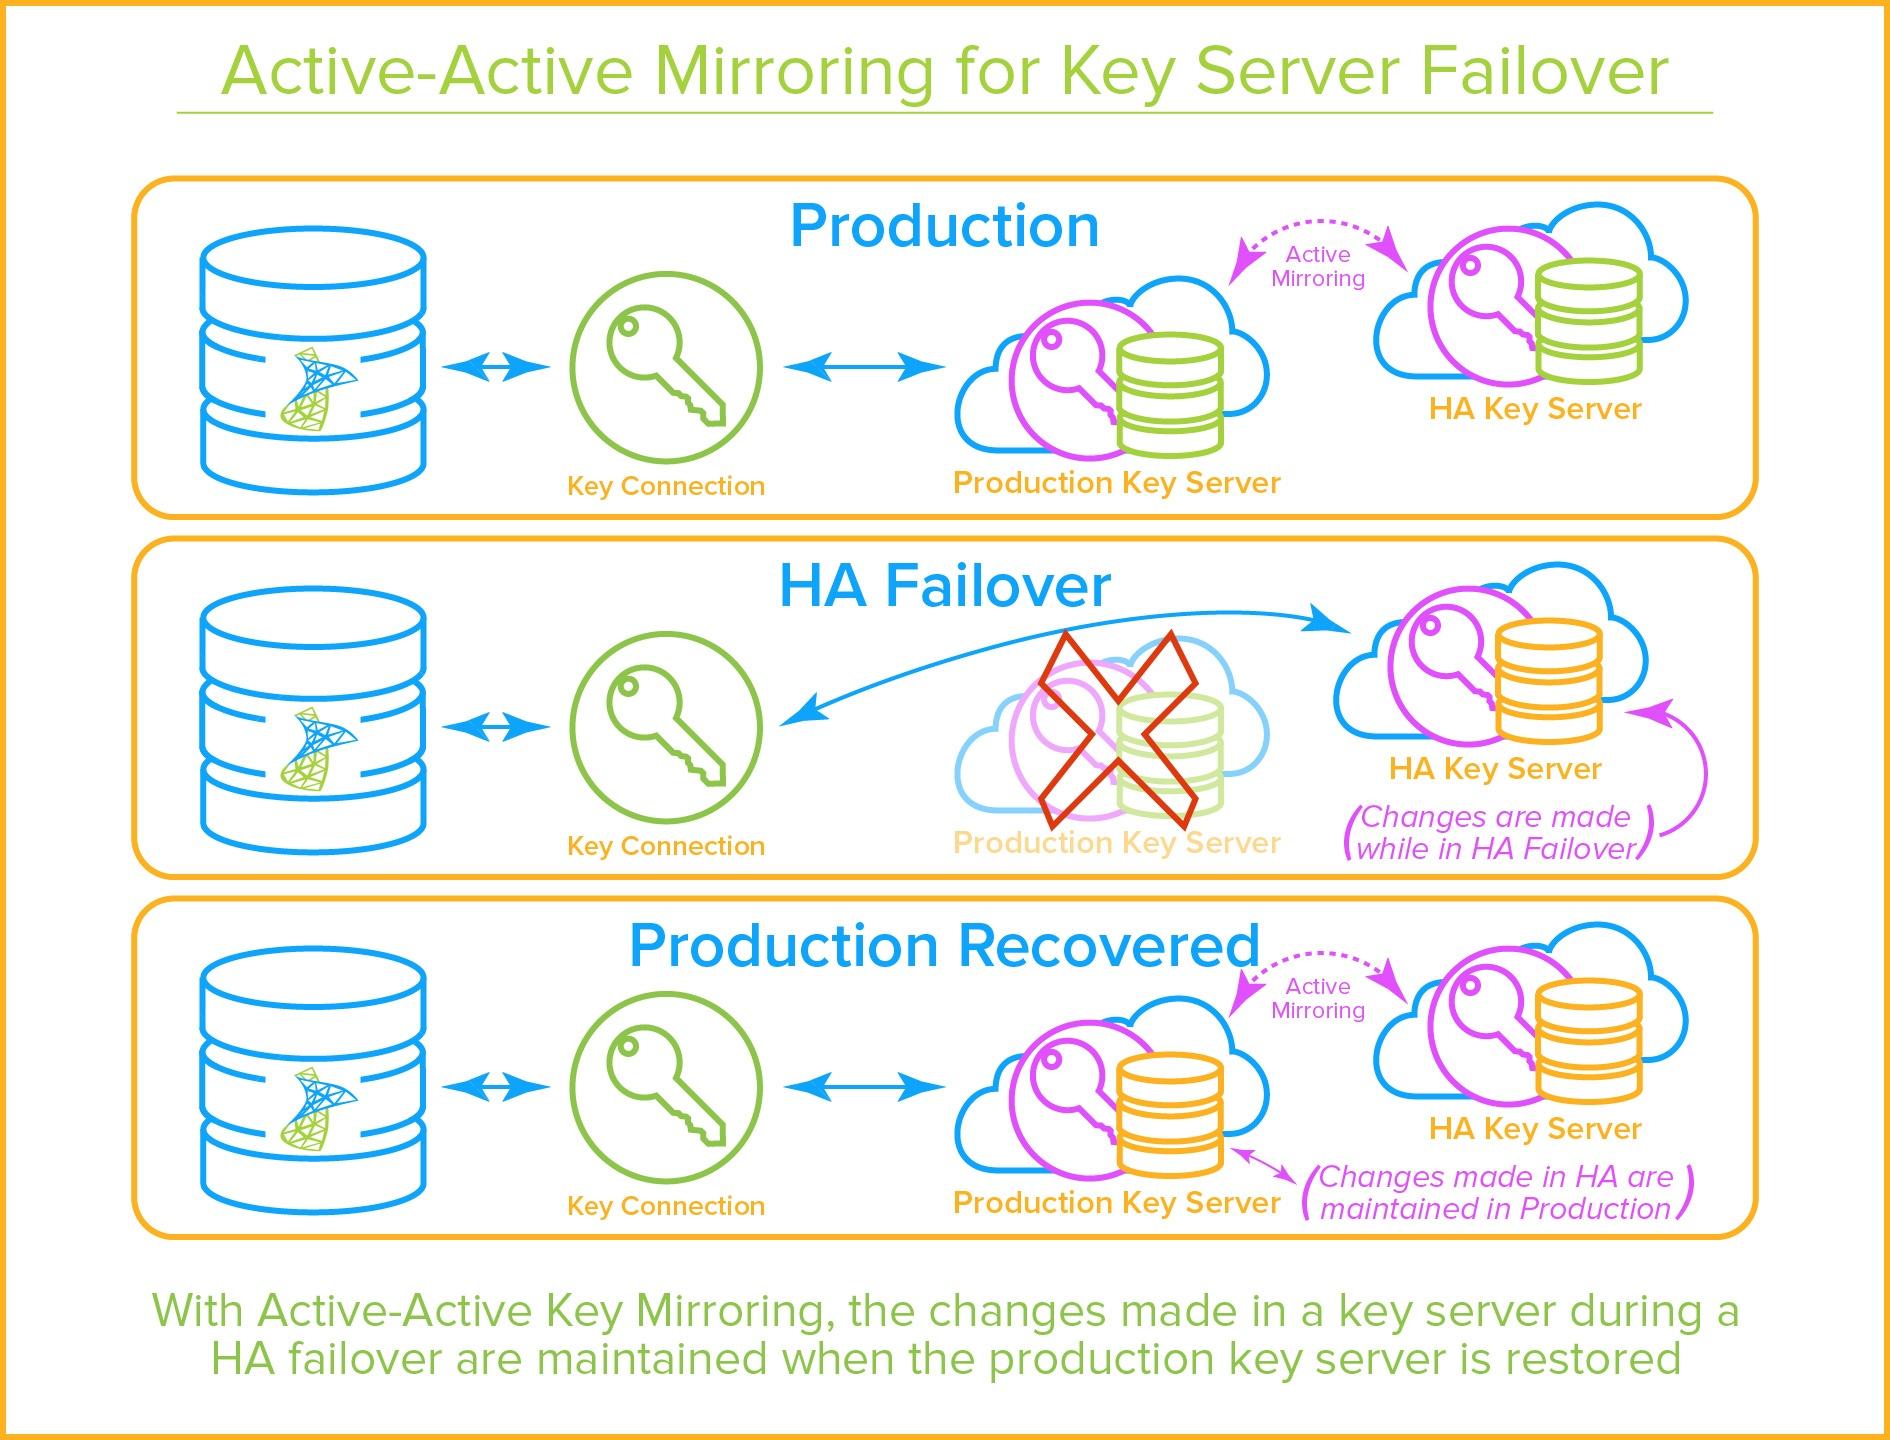 SQL Server EKM Provider - Active-Active Key Mirroring